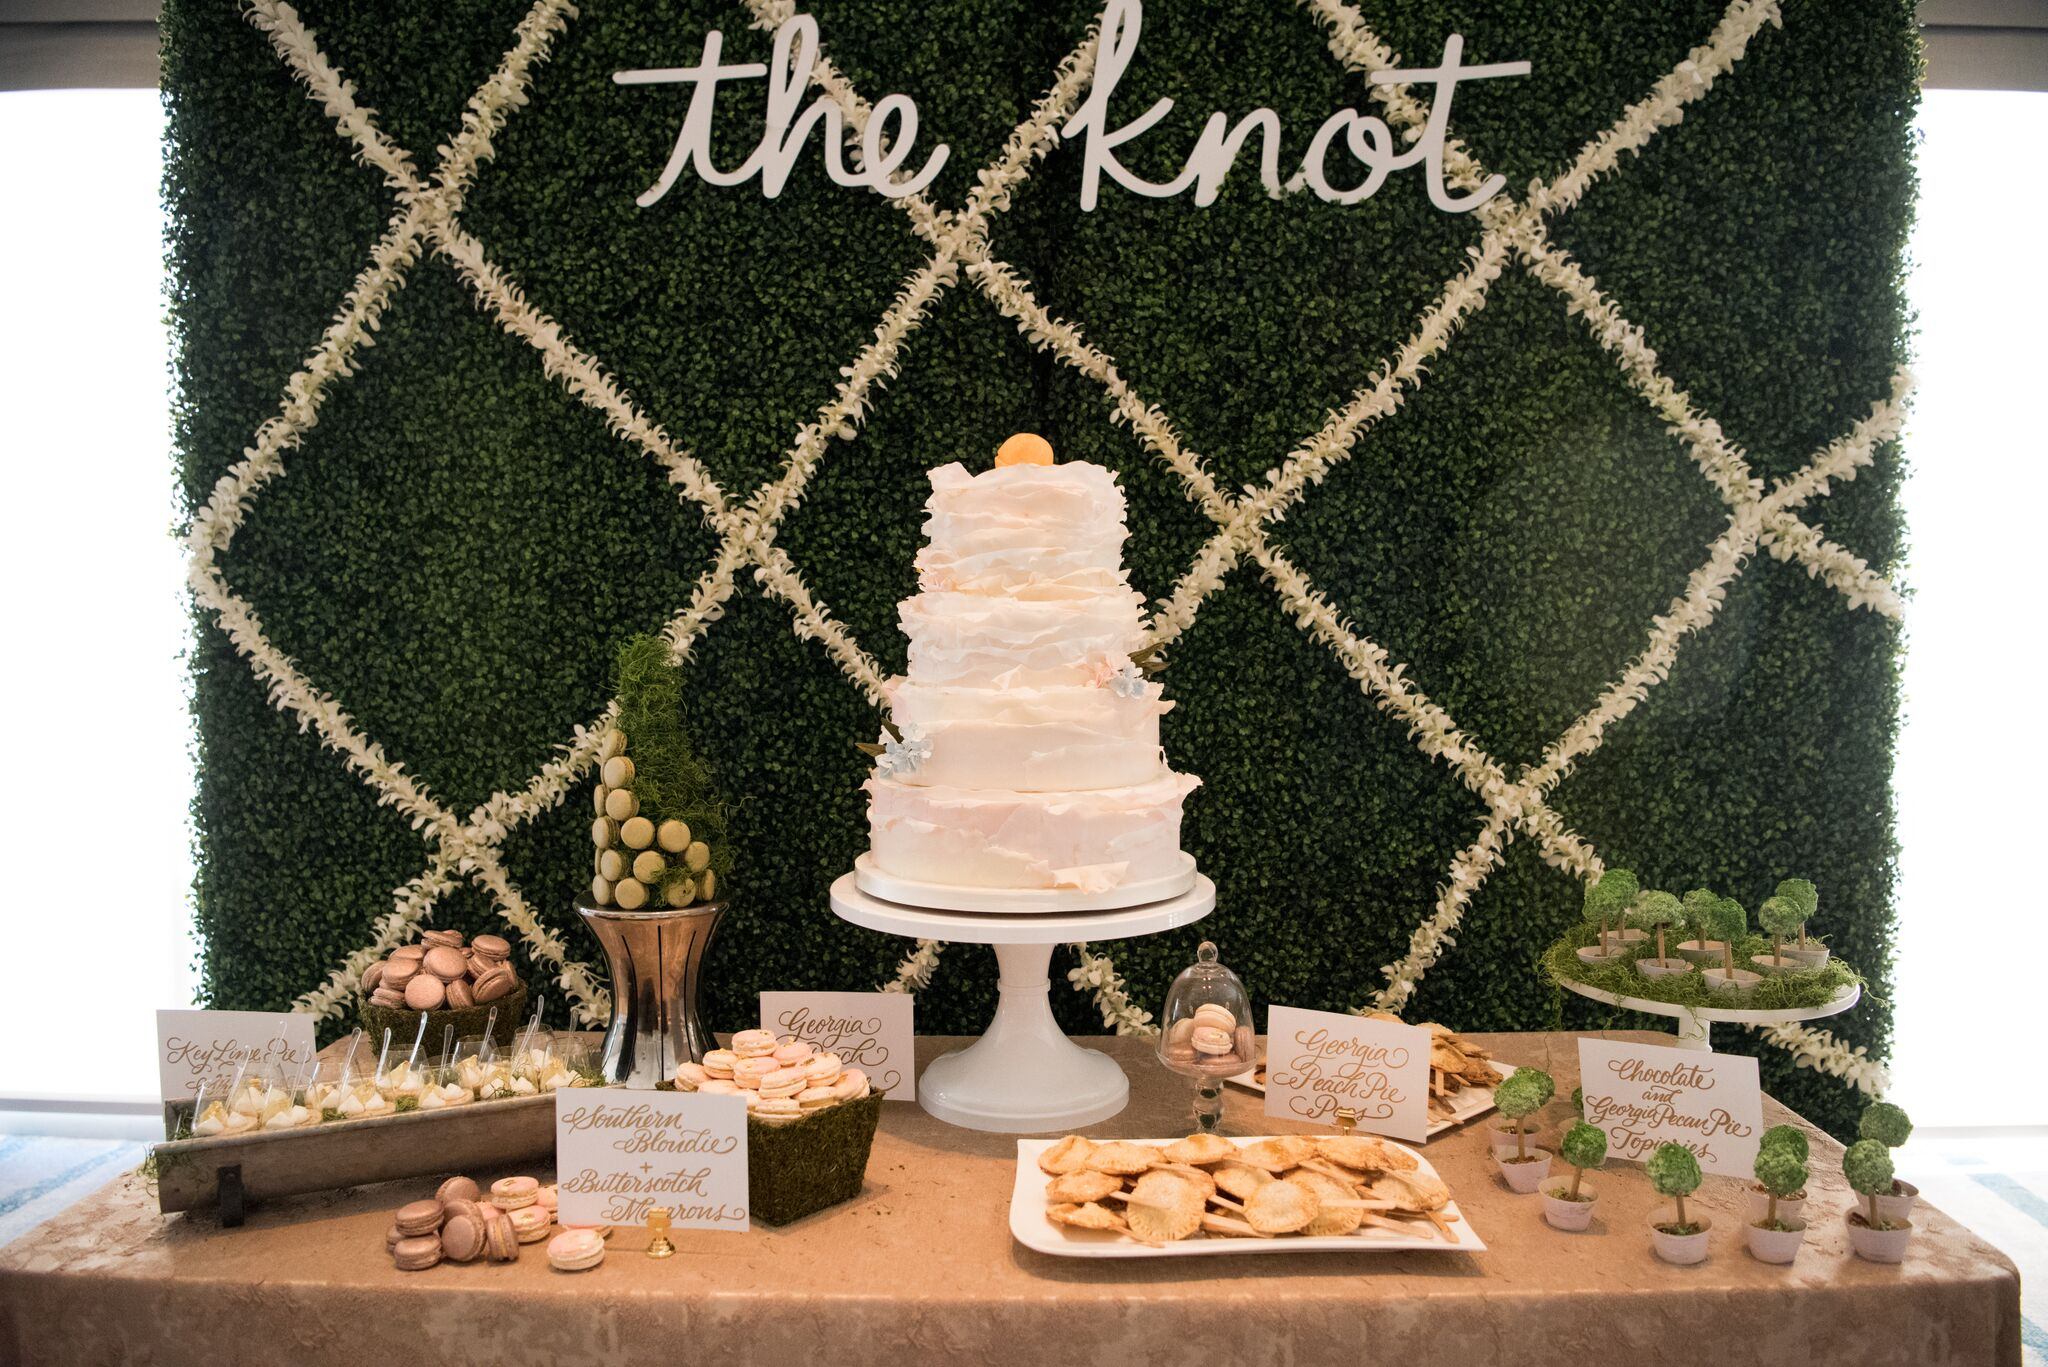 the-knot-savannah-ivory-and-beau-bridal-boutique-savannah-wedding-dress-savannah-bridal-boutique-savannah-bridal-shop-savannah-wedding-gowns-savannah-wedding-planner-savannah-wedding-coordinator-savannah-bridesmaids-dresses-5.jpeg